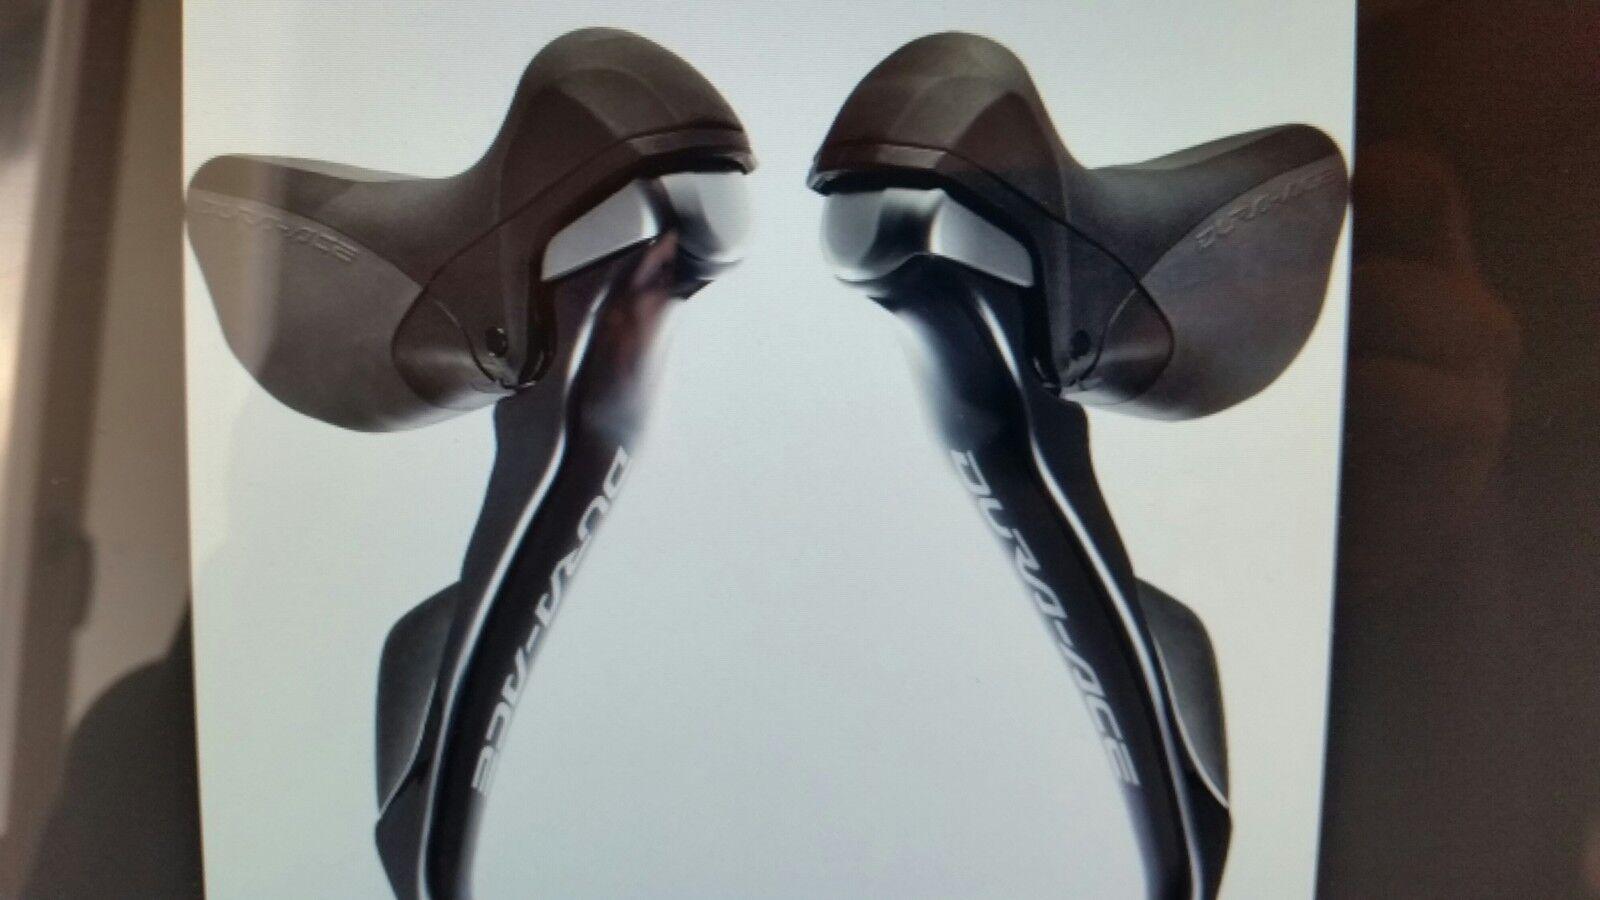 Shimano Pair kommandon Lever Dual Control Dura Ace st -9000 NY 2x11 deal